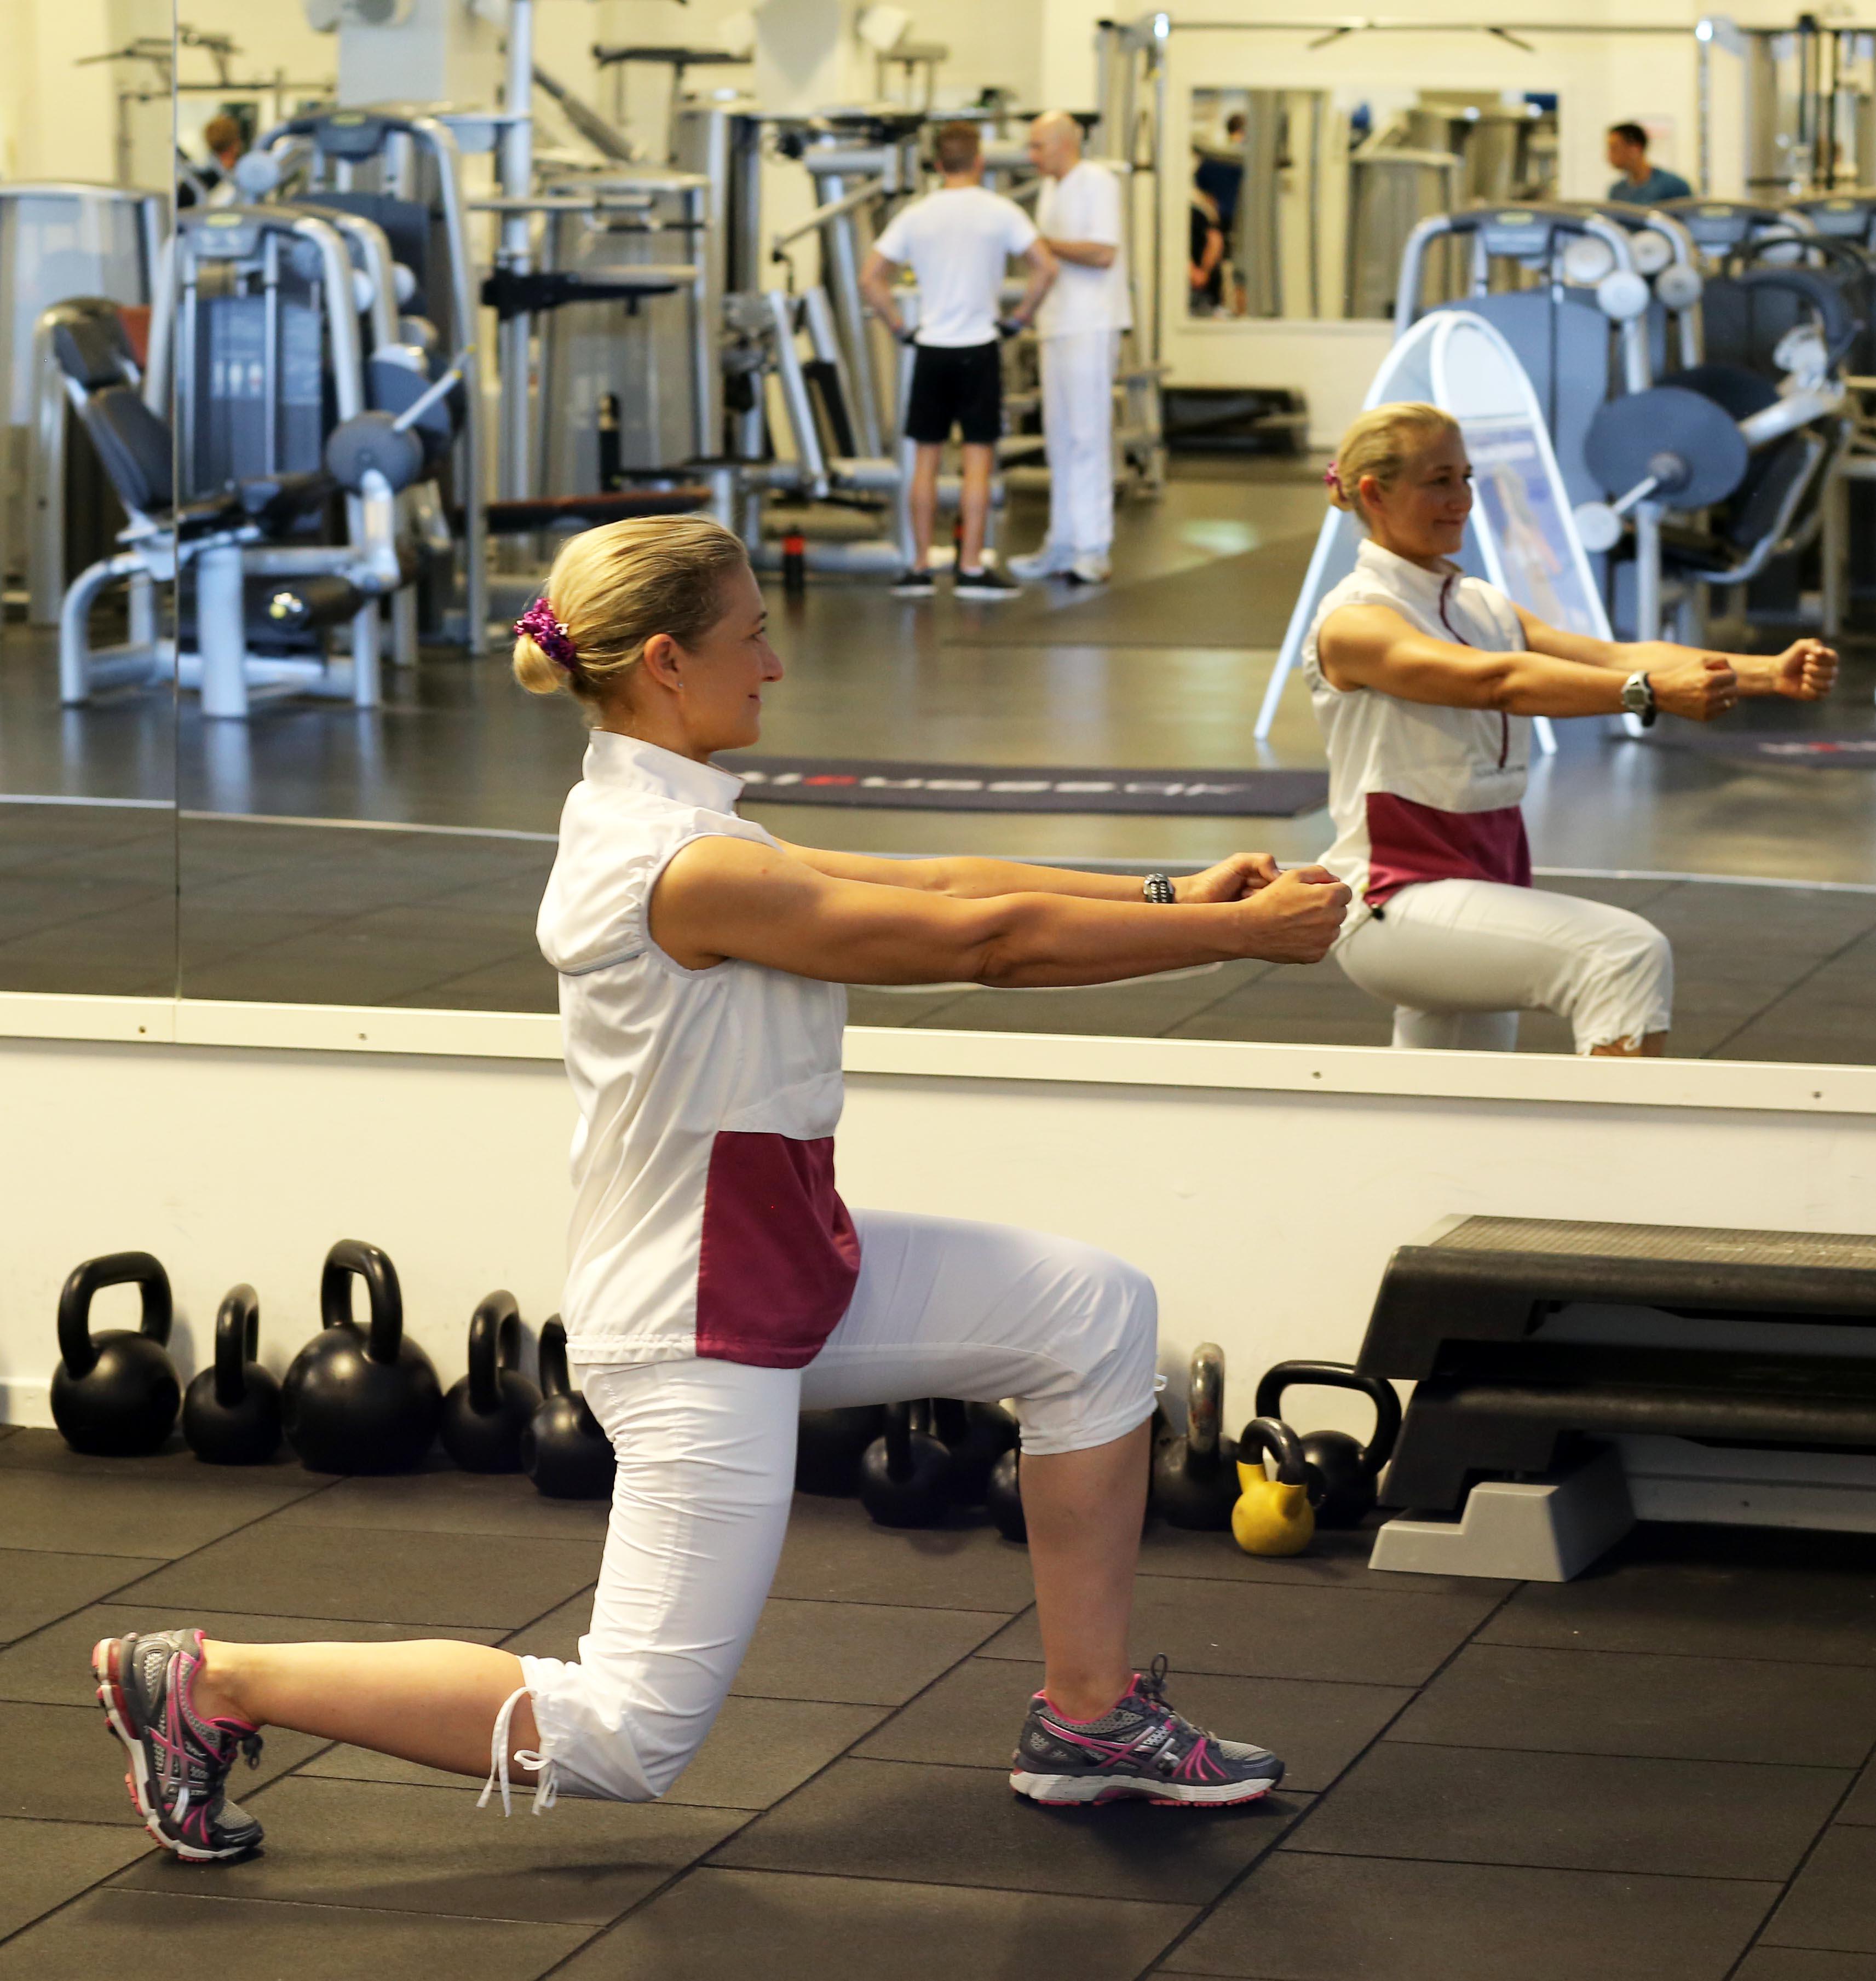 fitness lunge f 90 90 c